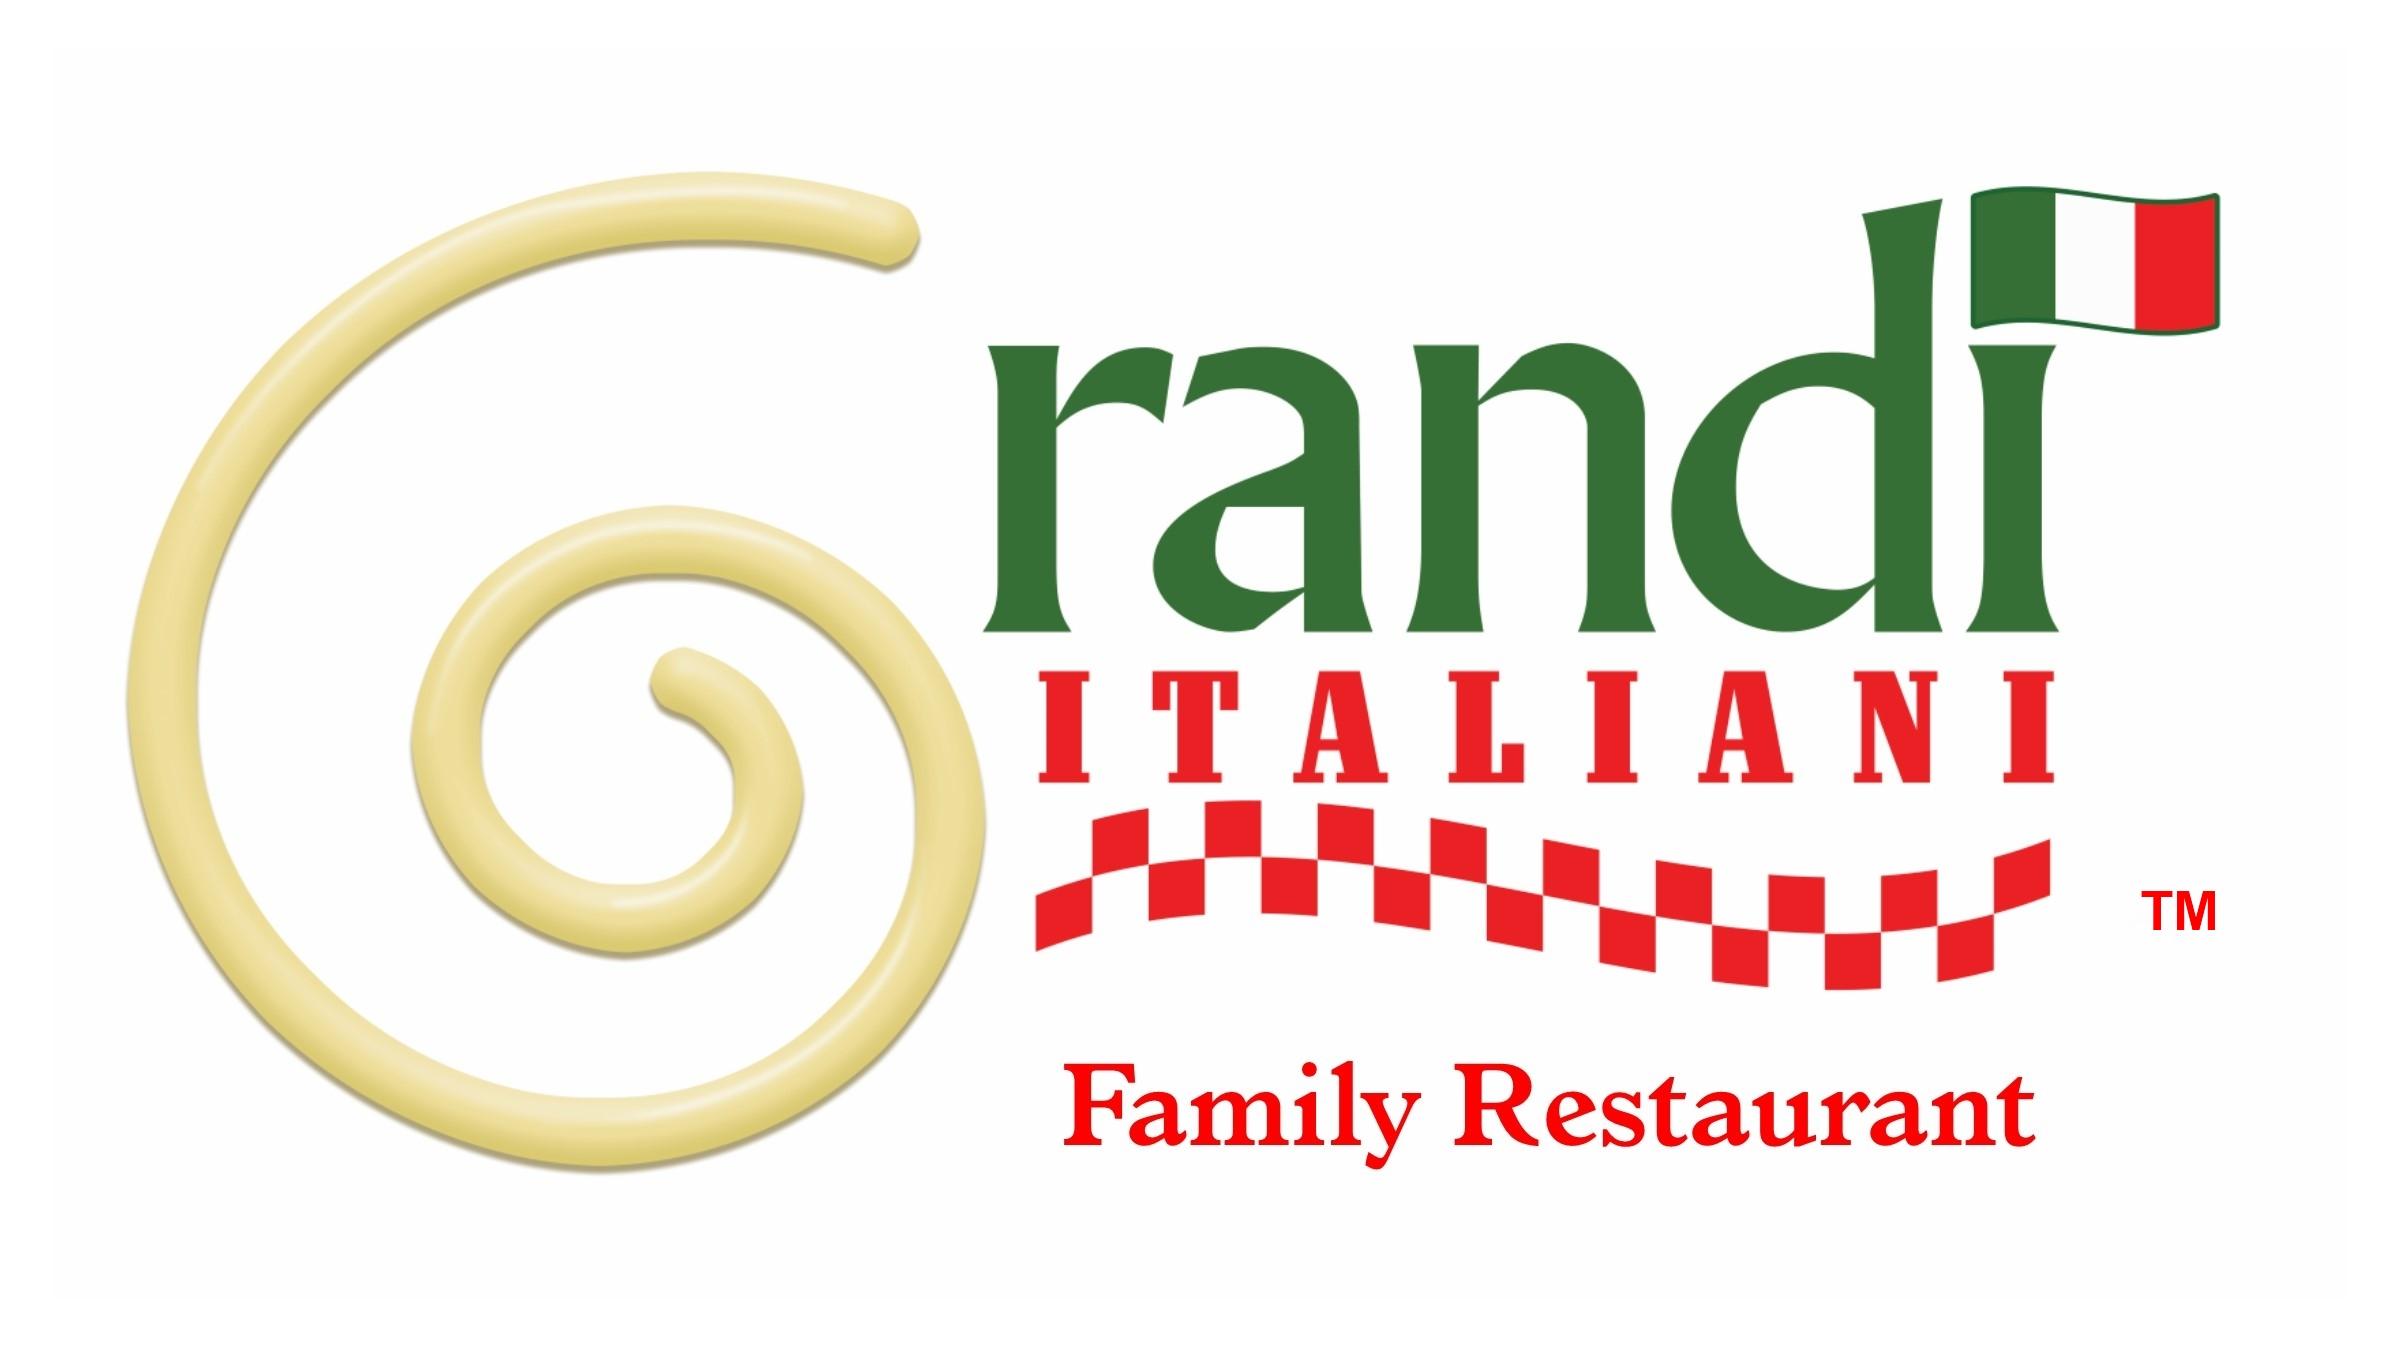 Logo_Grandi Italiani, Family Restaurant.jpg